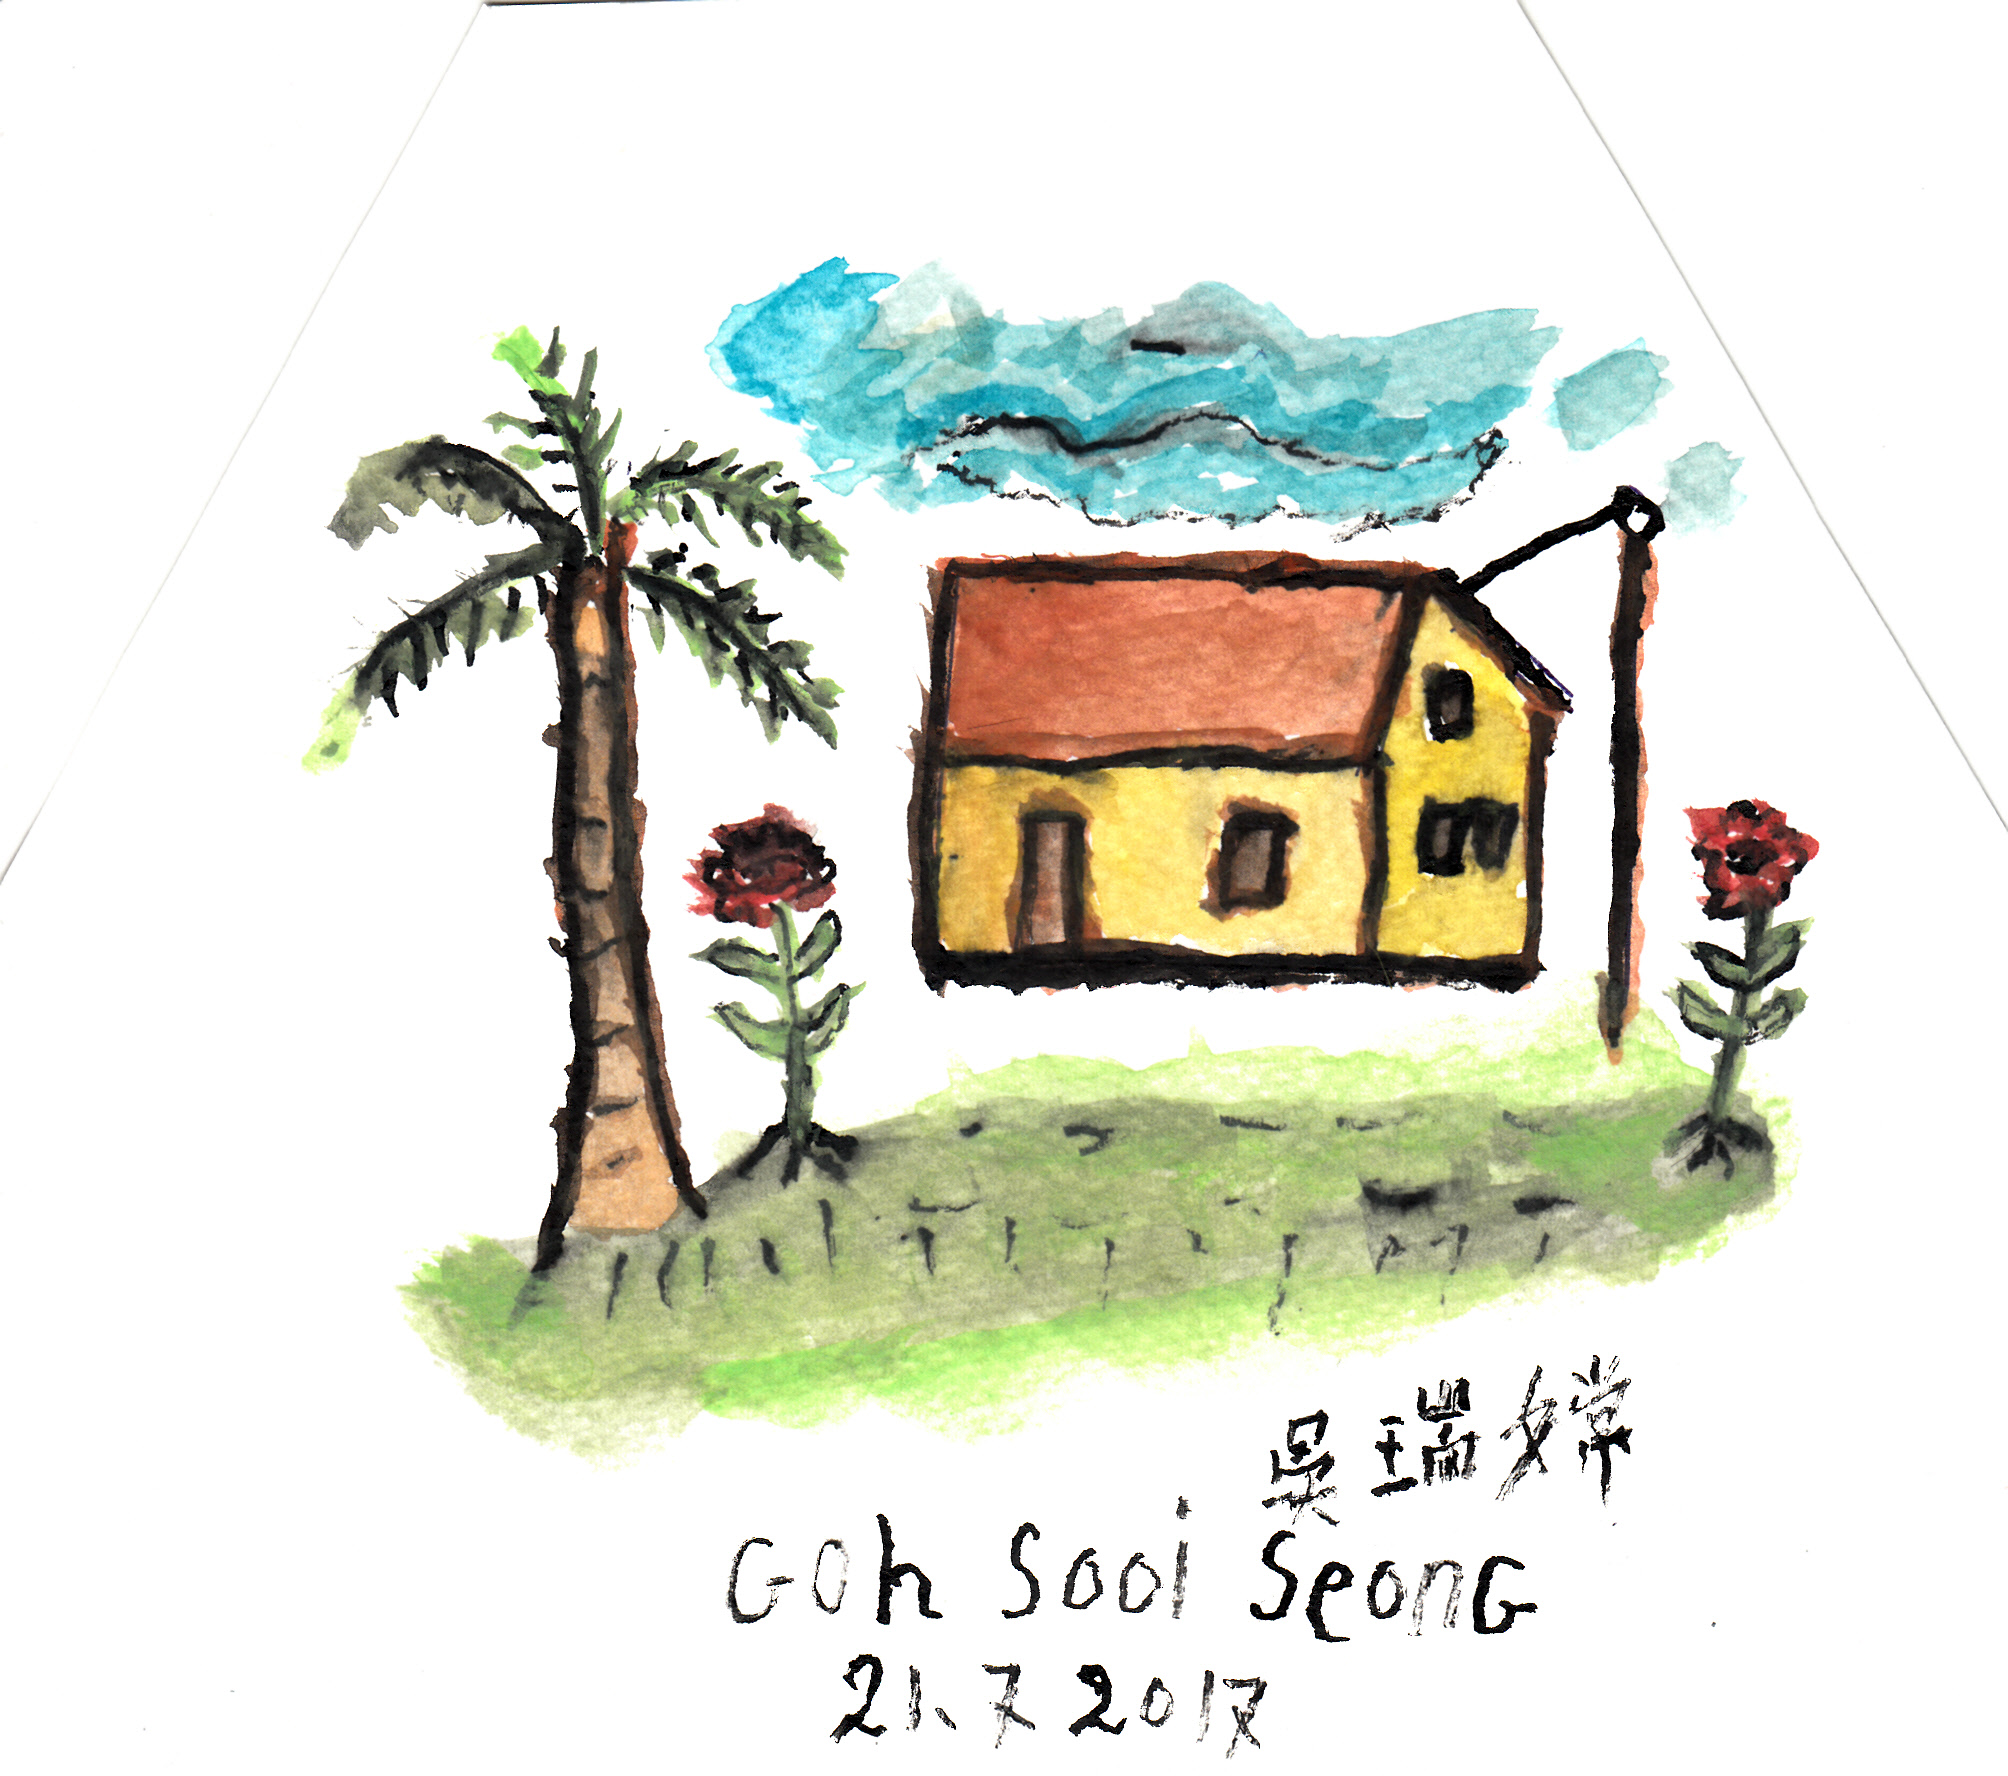 Goh Sooi Seong 3.jpg